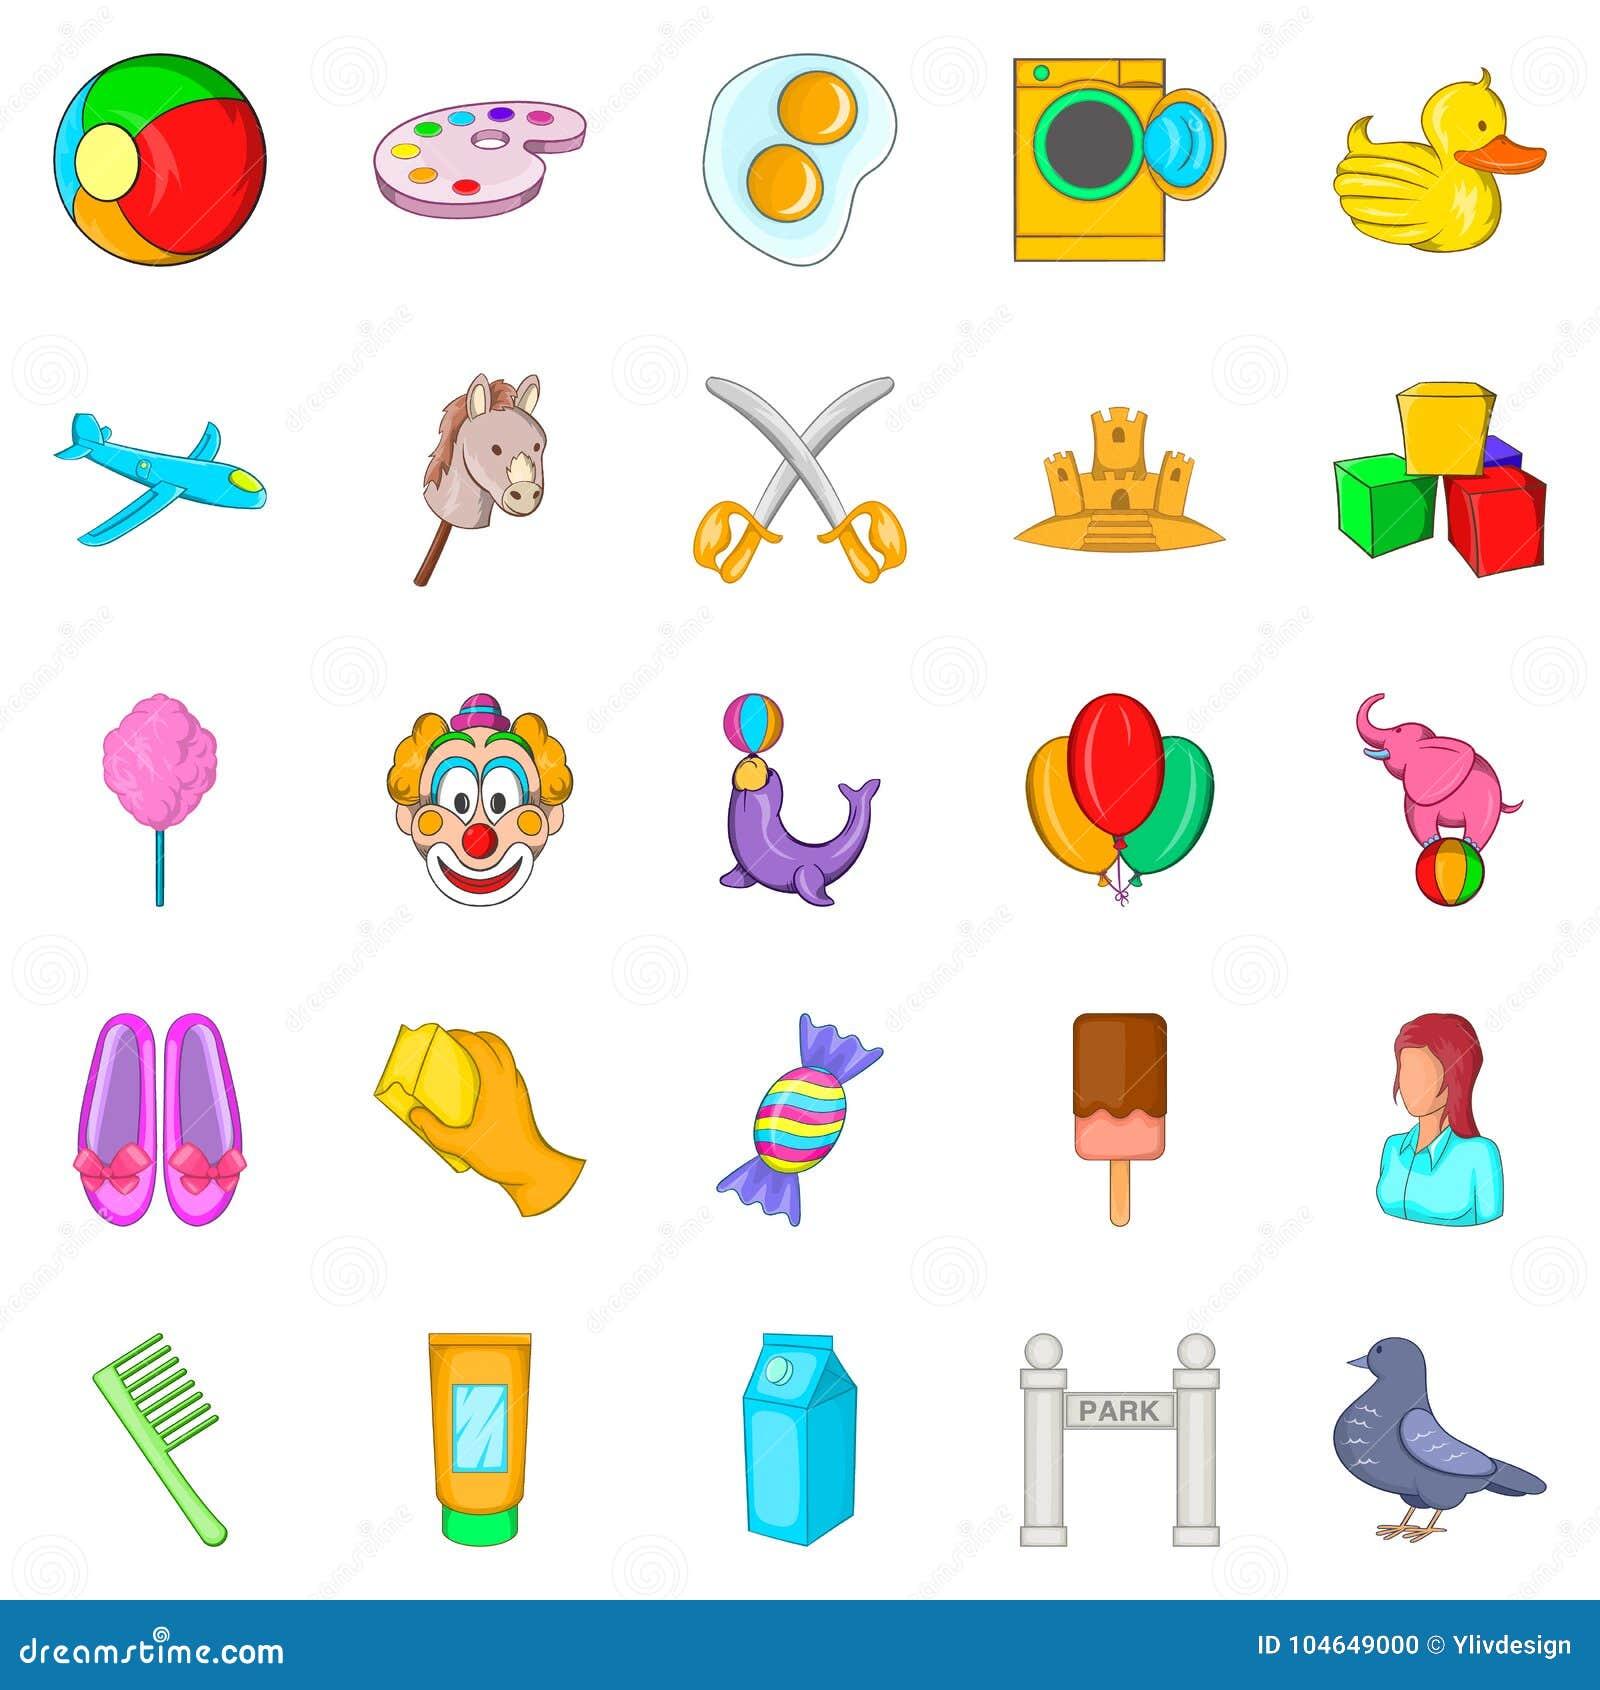 Icones Ajustados Estilo Da Baby Sitter Dos Desenhos Animados